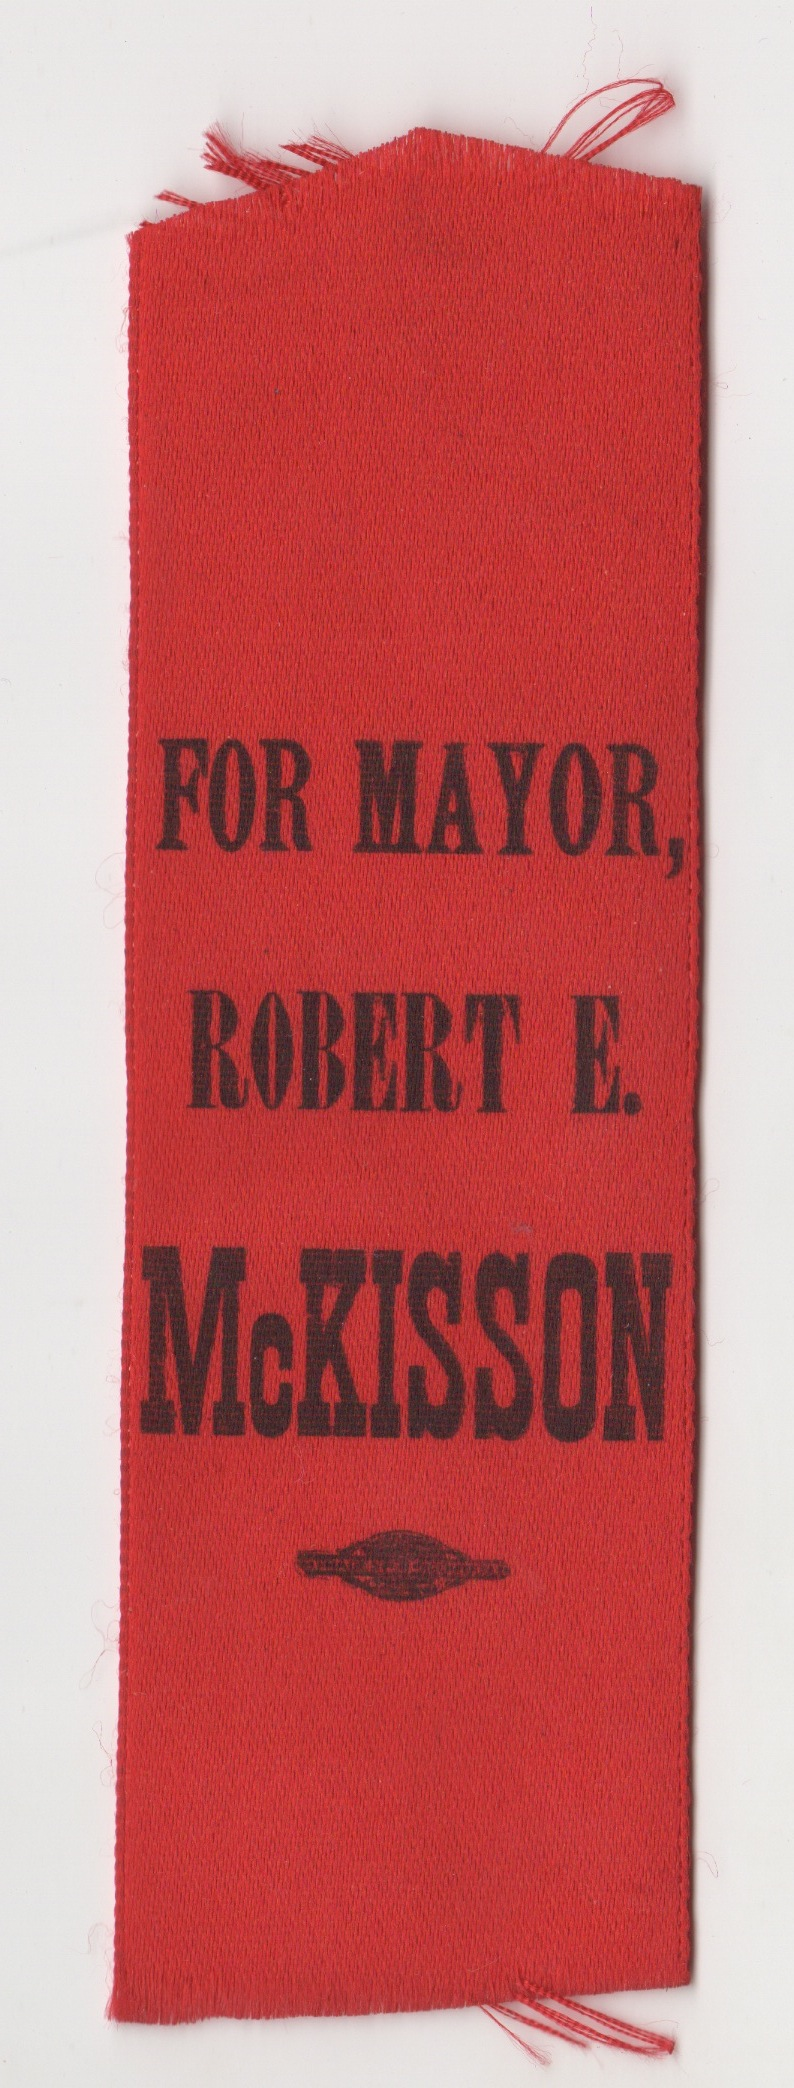 OHMayor-McKISSON02.jpeg